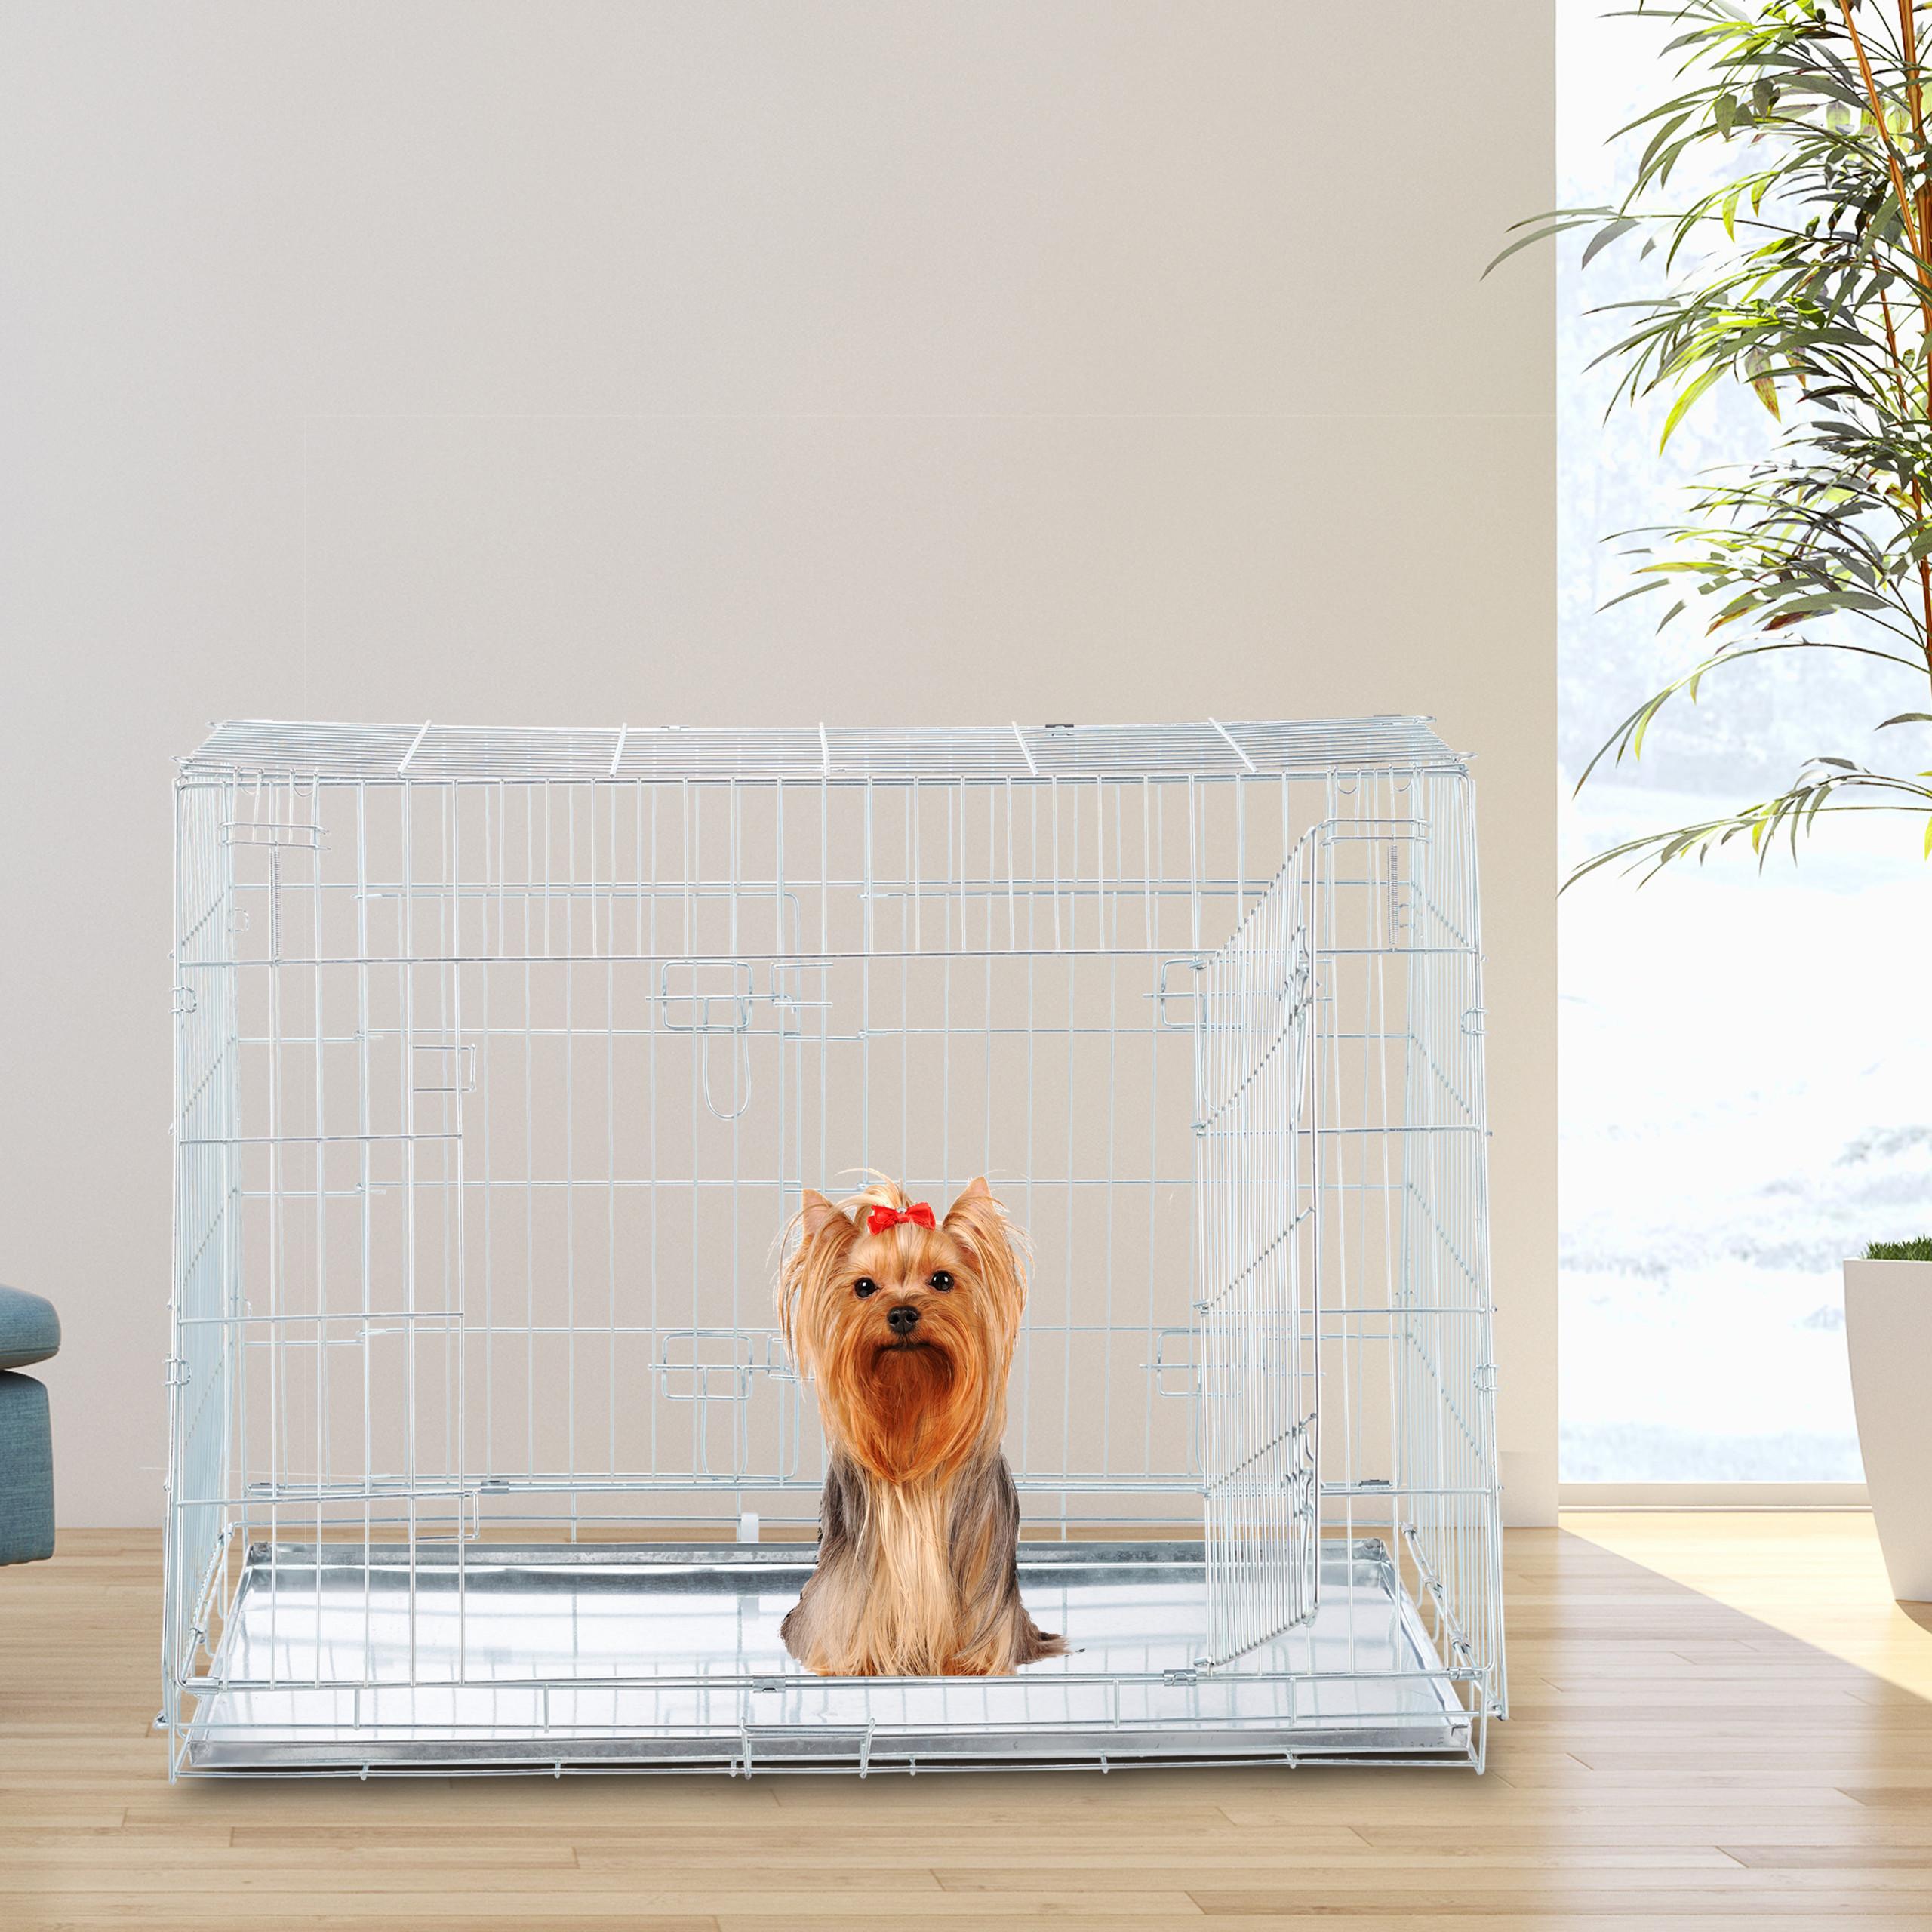 Hondenbench-dubbel-transportbench-transportbox-draadkooi-hond-L-XL-opvouwbaar miniatuur 3